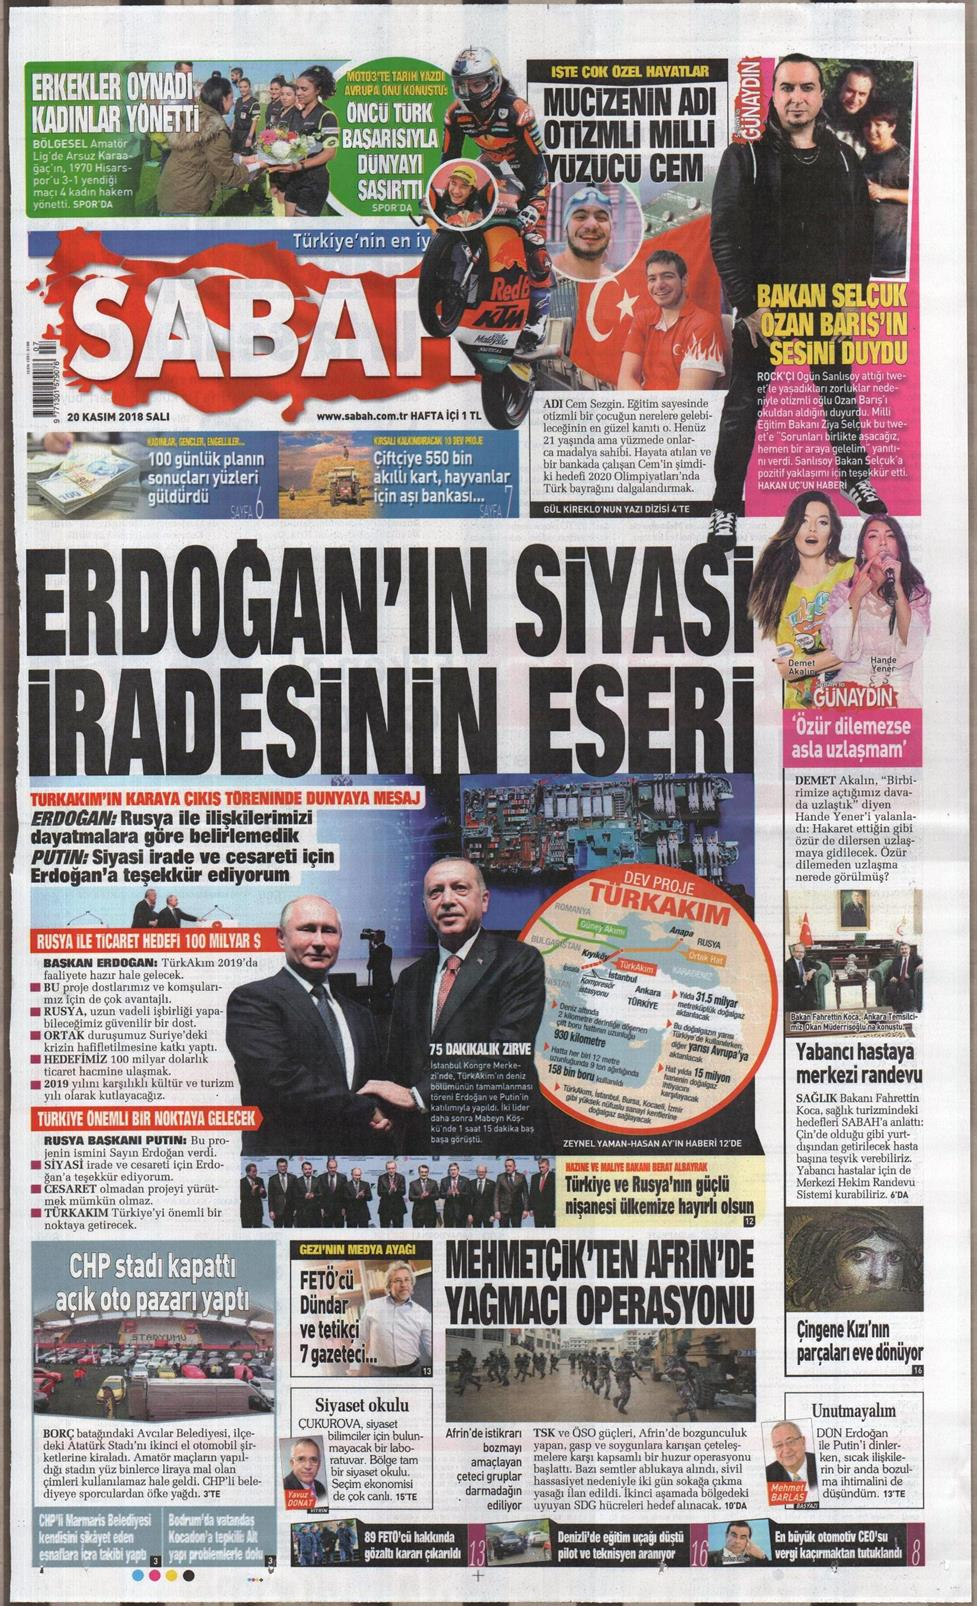 13 Nisan 2019 Cumartesi Sabah Gazetesi Manşet